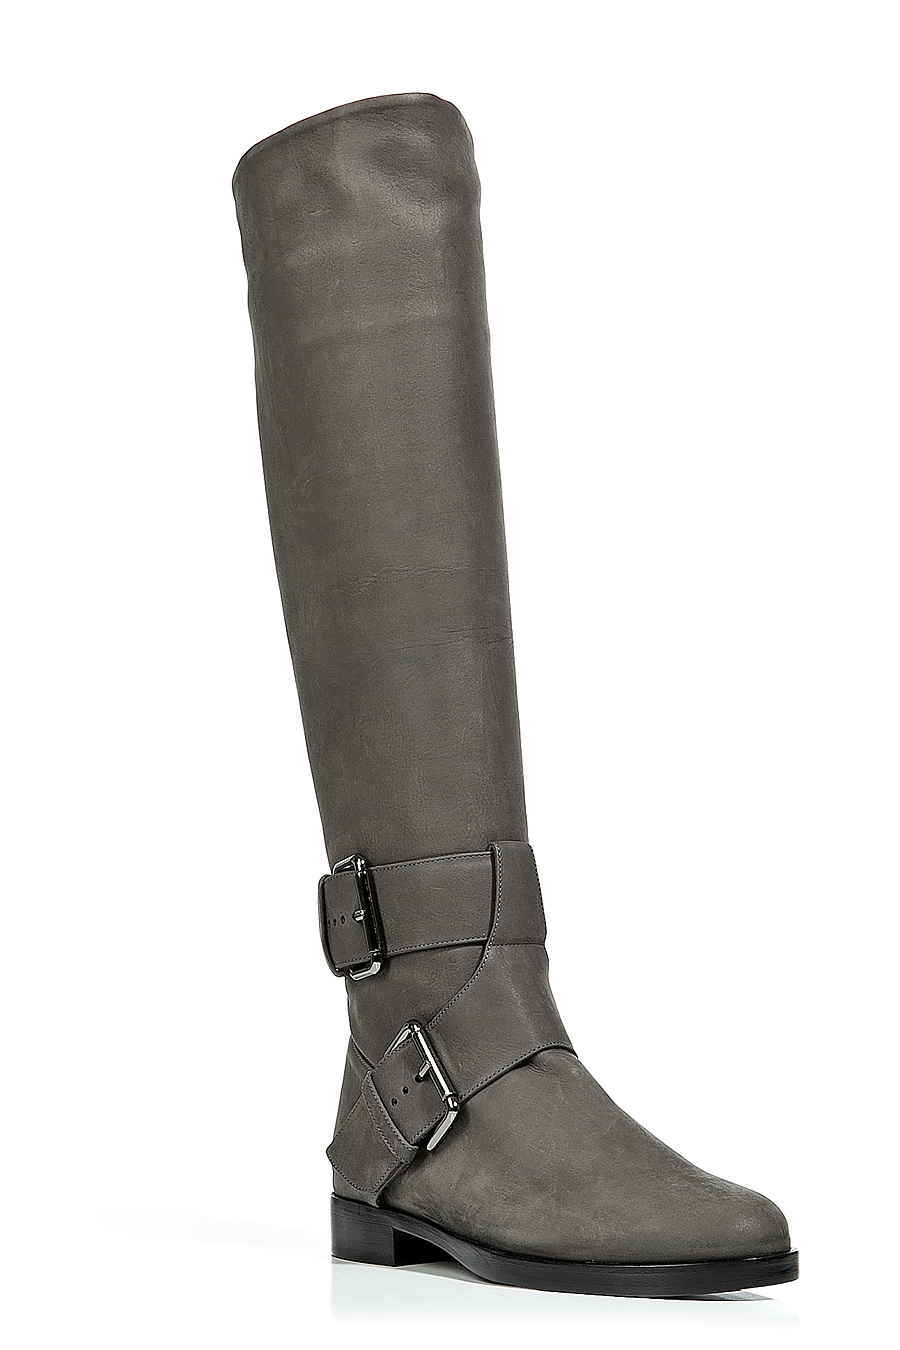 Pierre Hardy Buckle Knee-High Boots In Grey